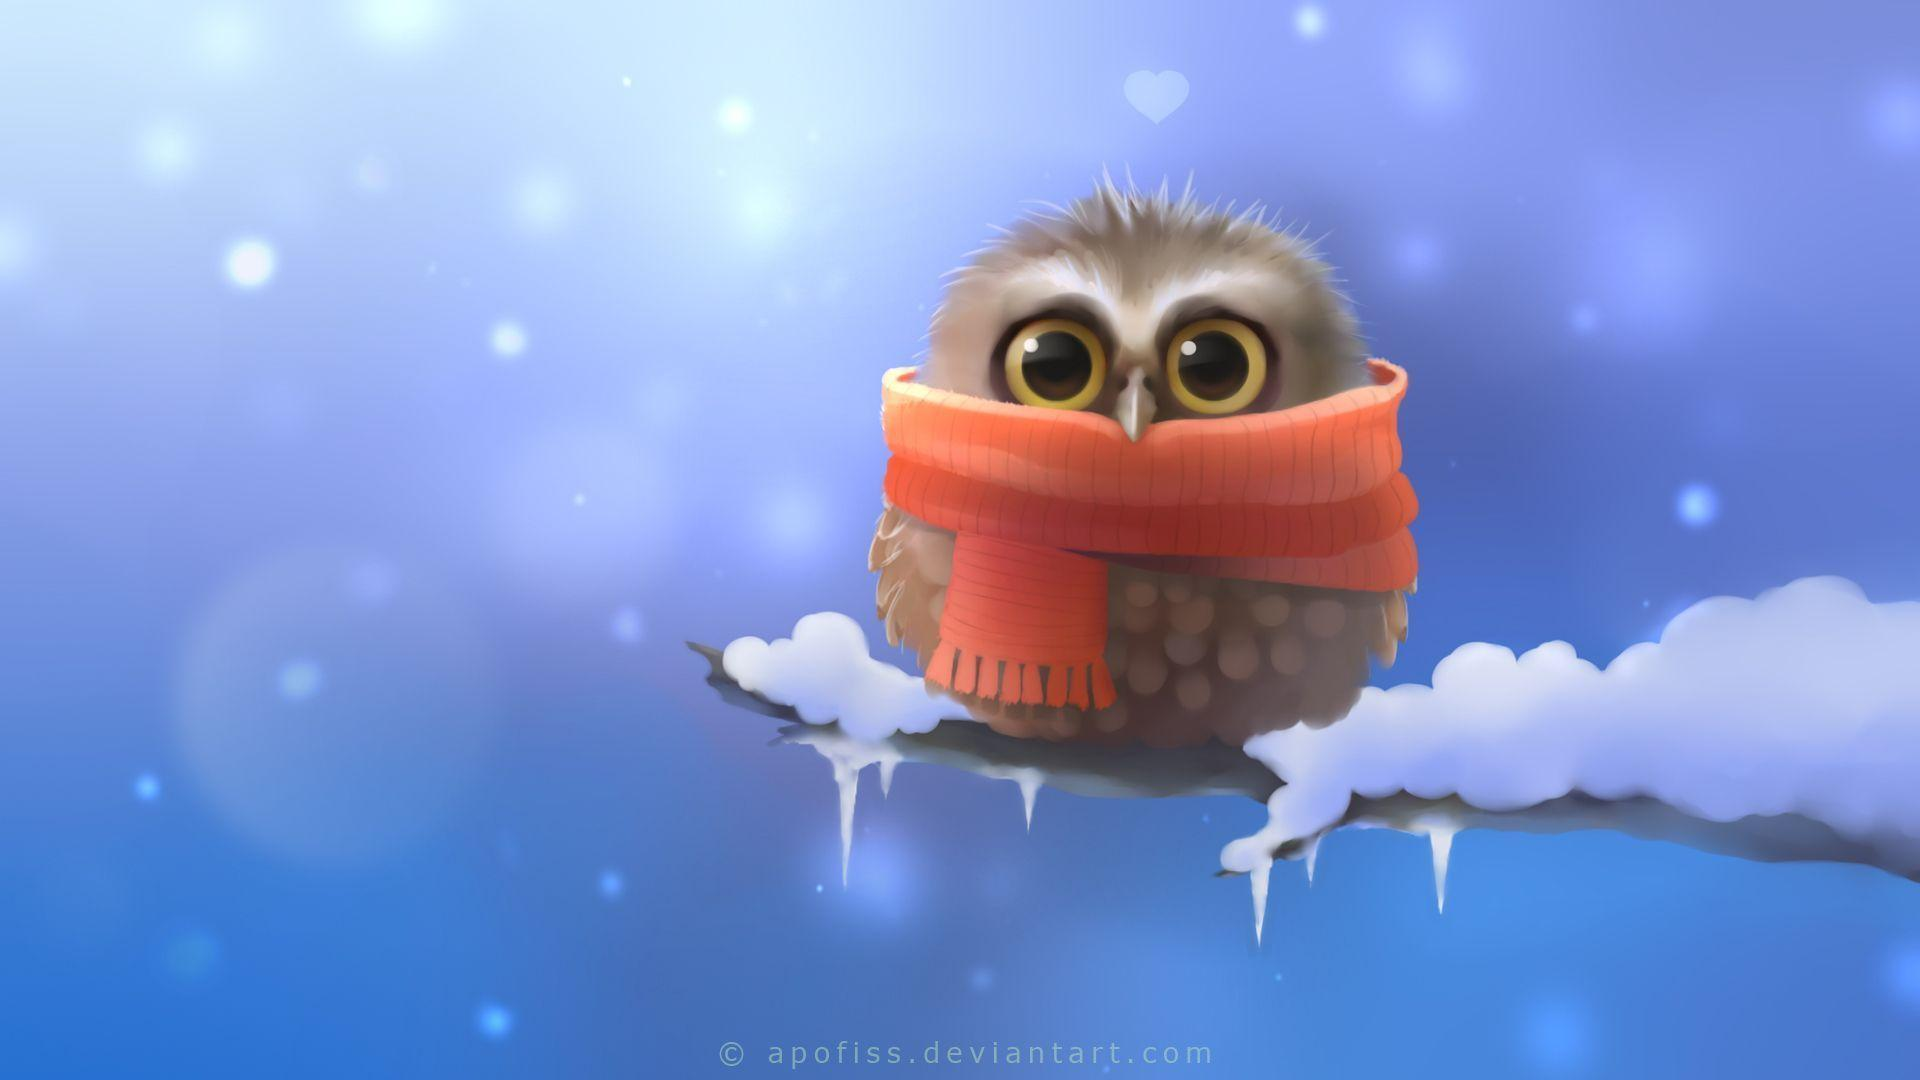 owl graphics new hd desktop wallpapers free download